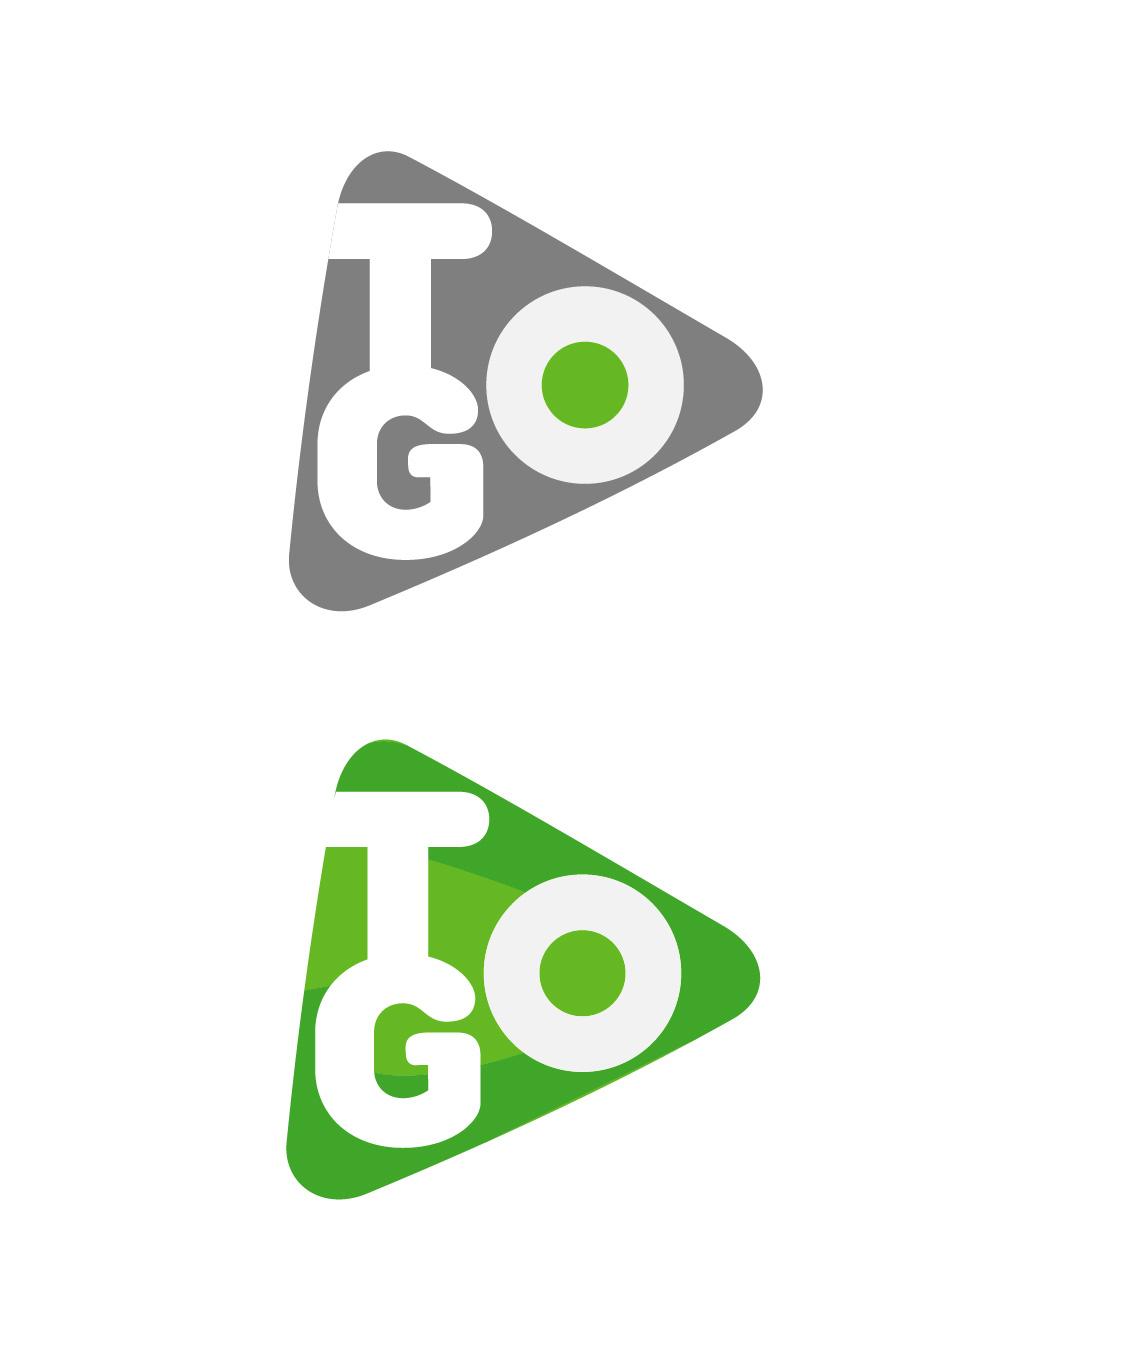 Разработать логотип и экран загрузки приложения фото f_8325a81762a04808.jpg